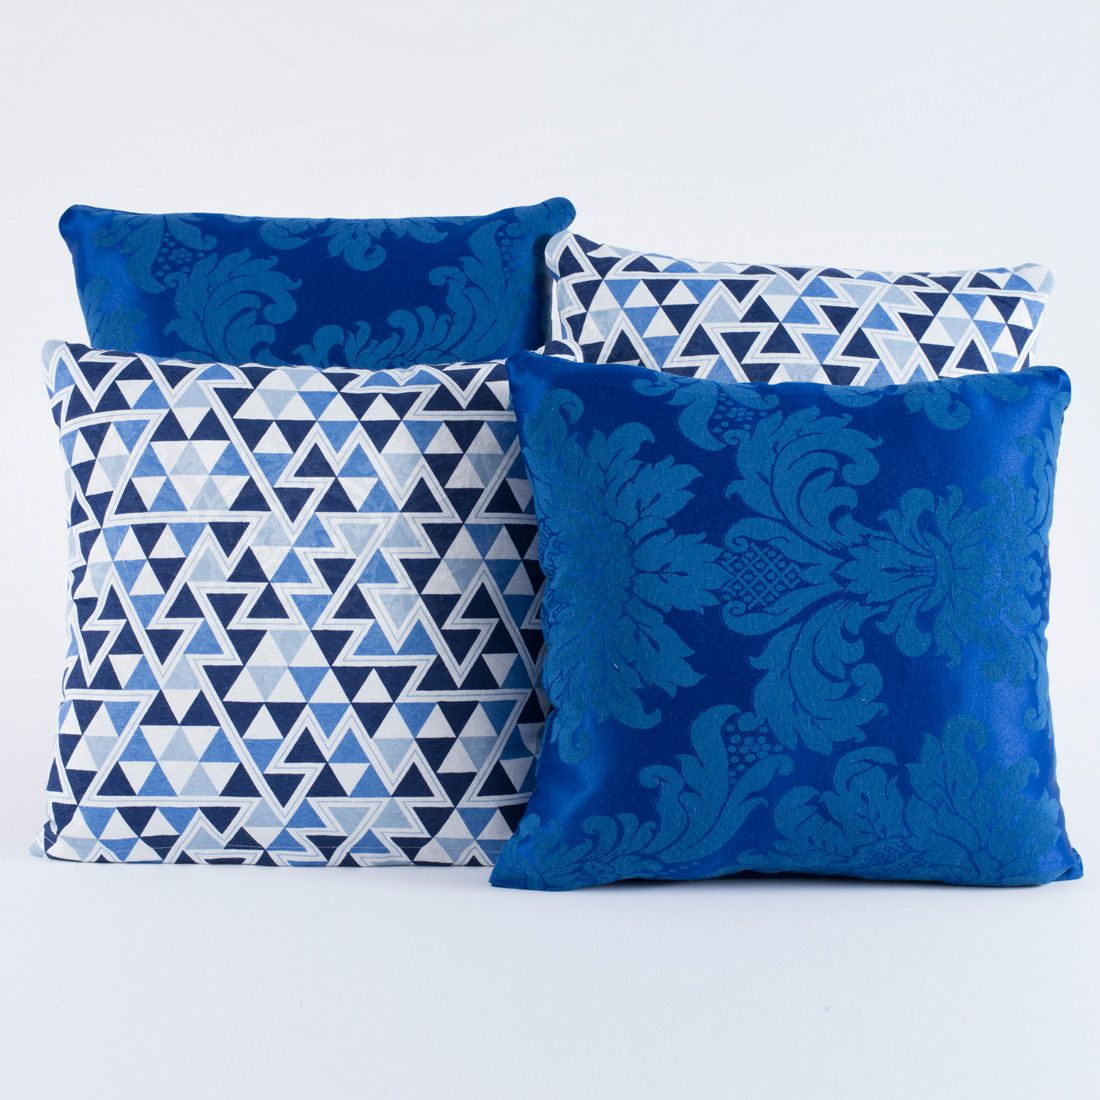 Kit c/ 4 Almofadas Cheias Decorativas Geométrico Azul Royal 04 Peças c/ Refil